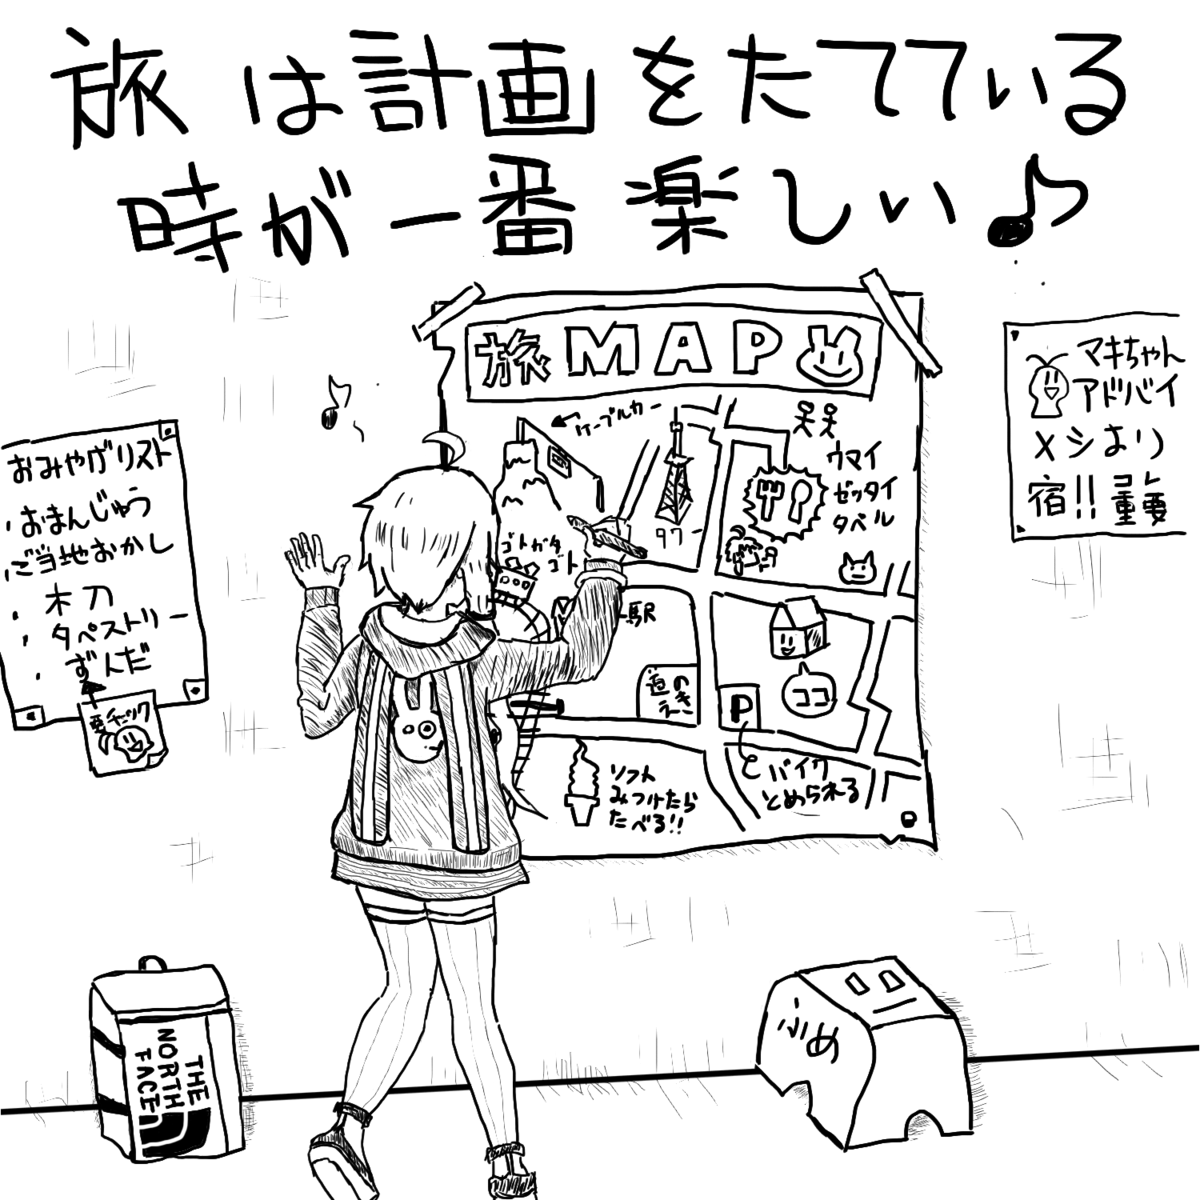 f:id:zomuzomu:20191111070527p:plain